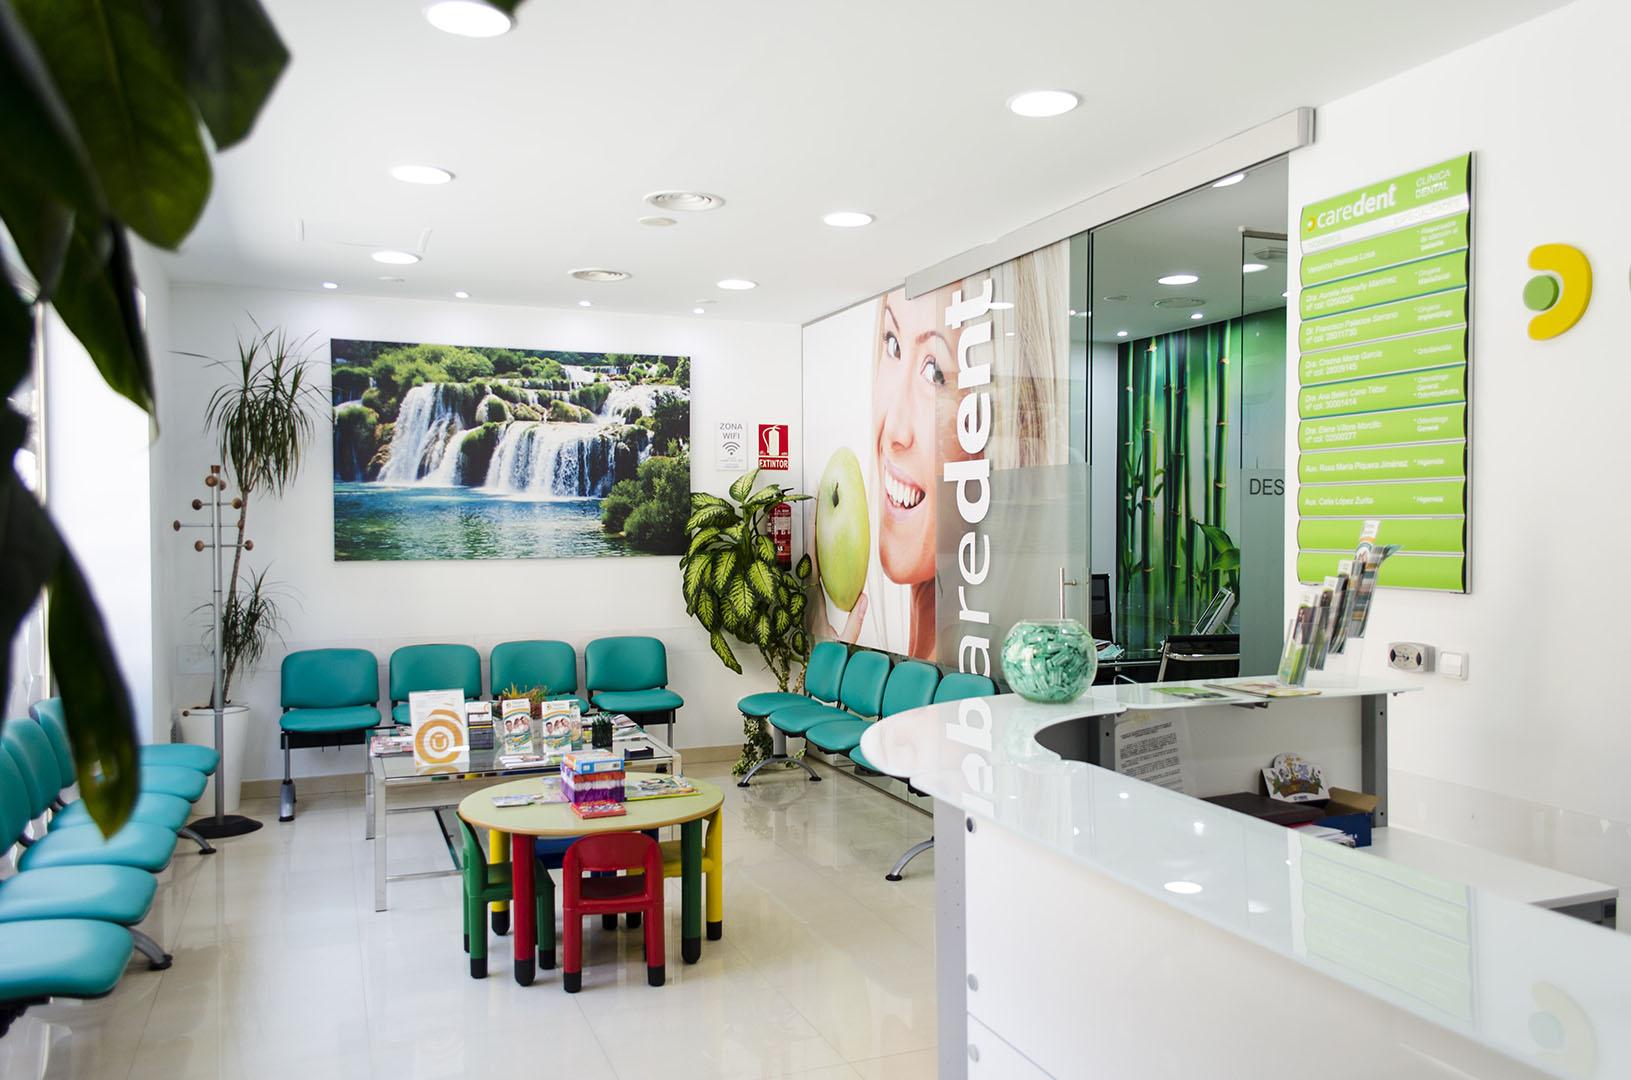 Caredent Albacete clínica dental - Sala de espera